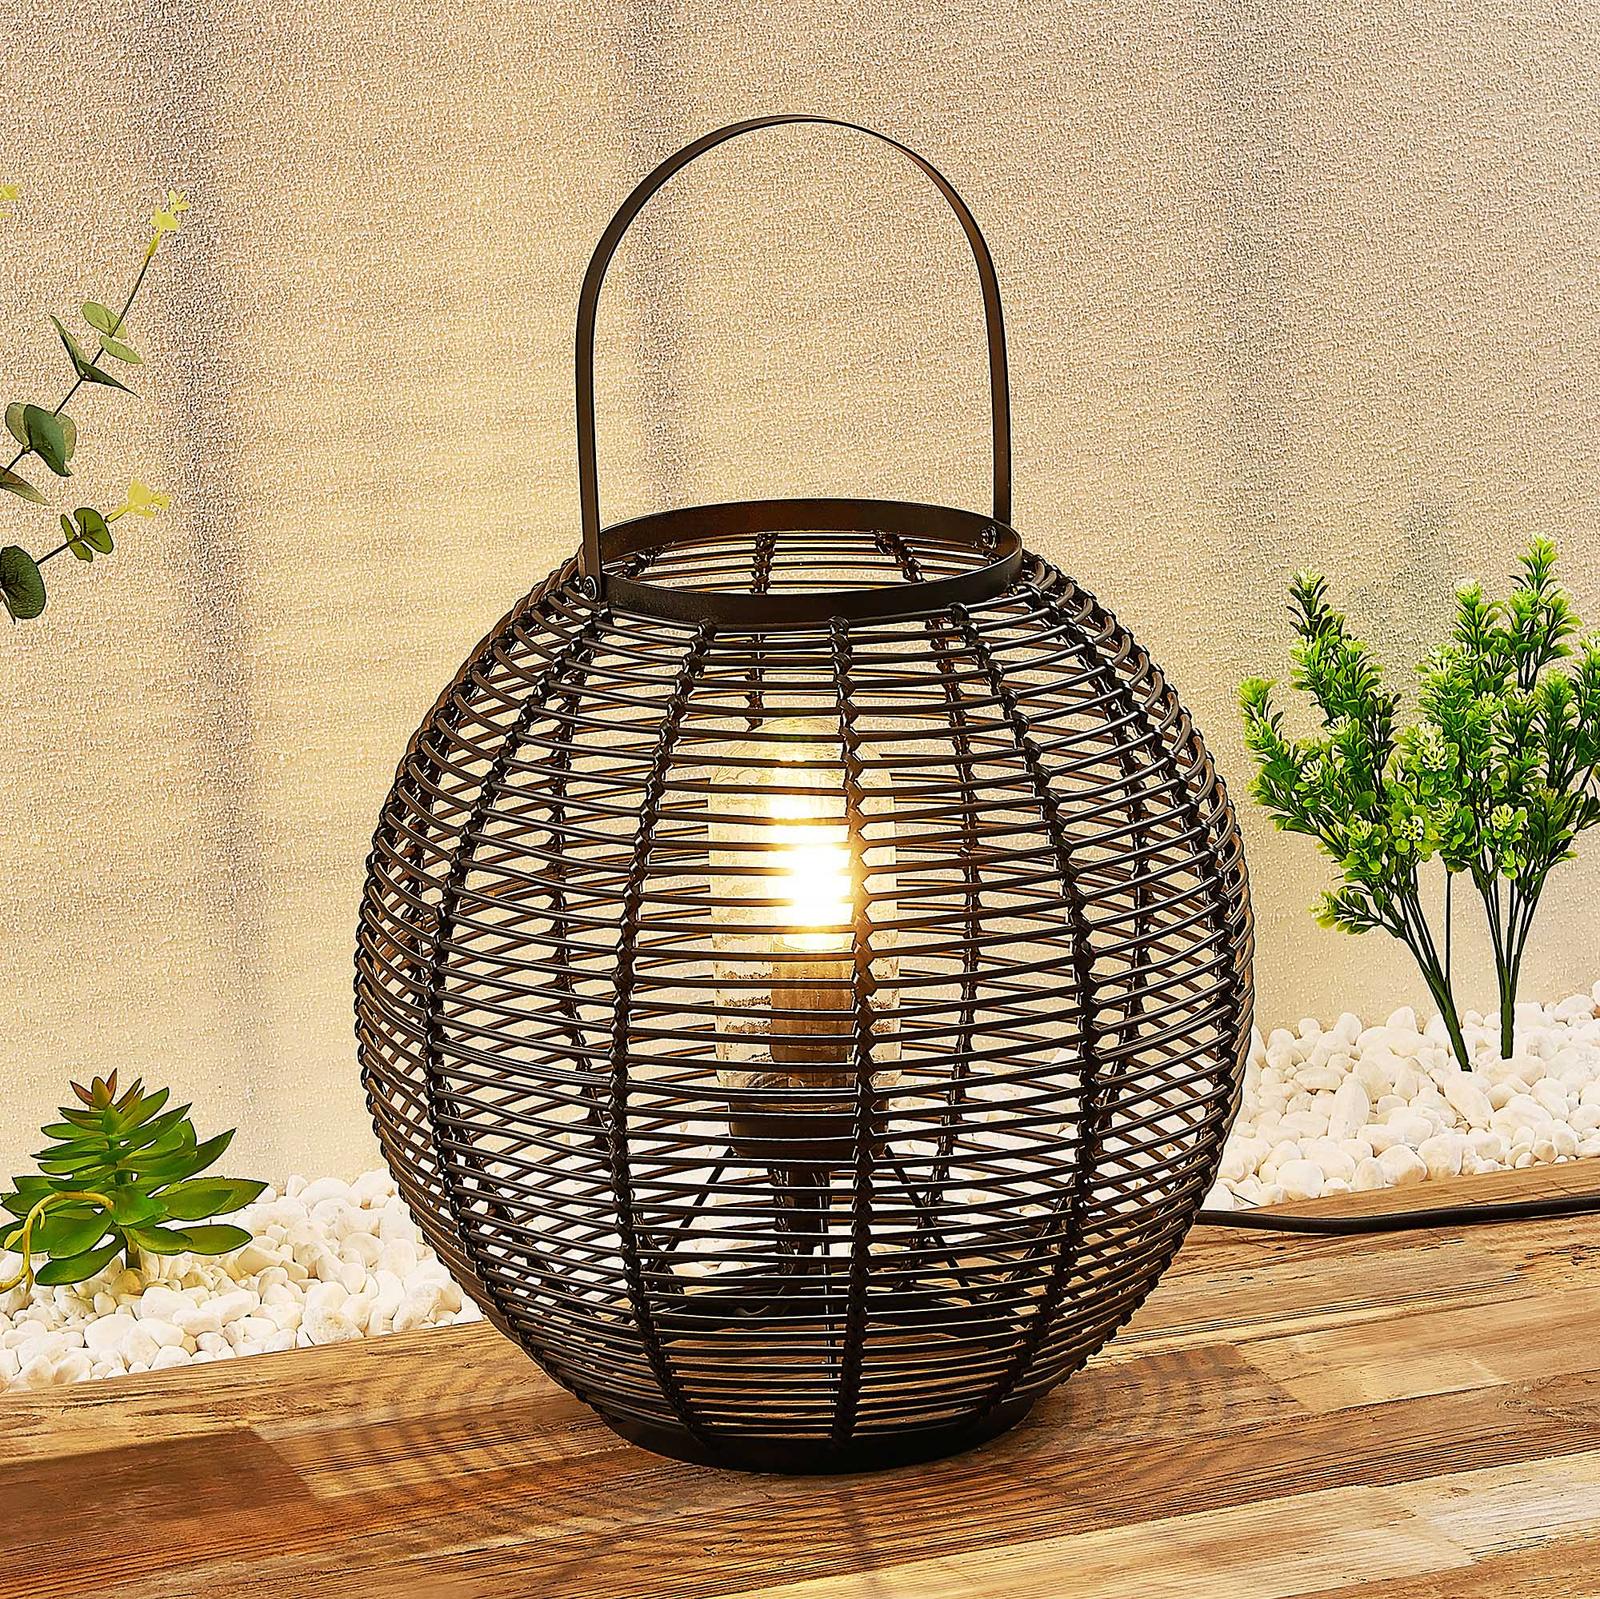 Arcchio Feysal bordslampa för utomhus